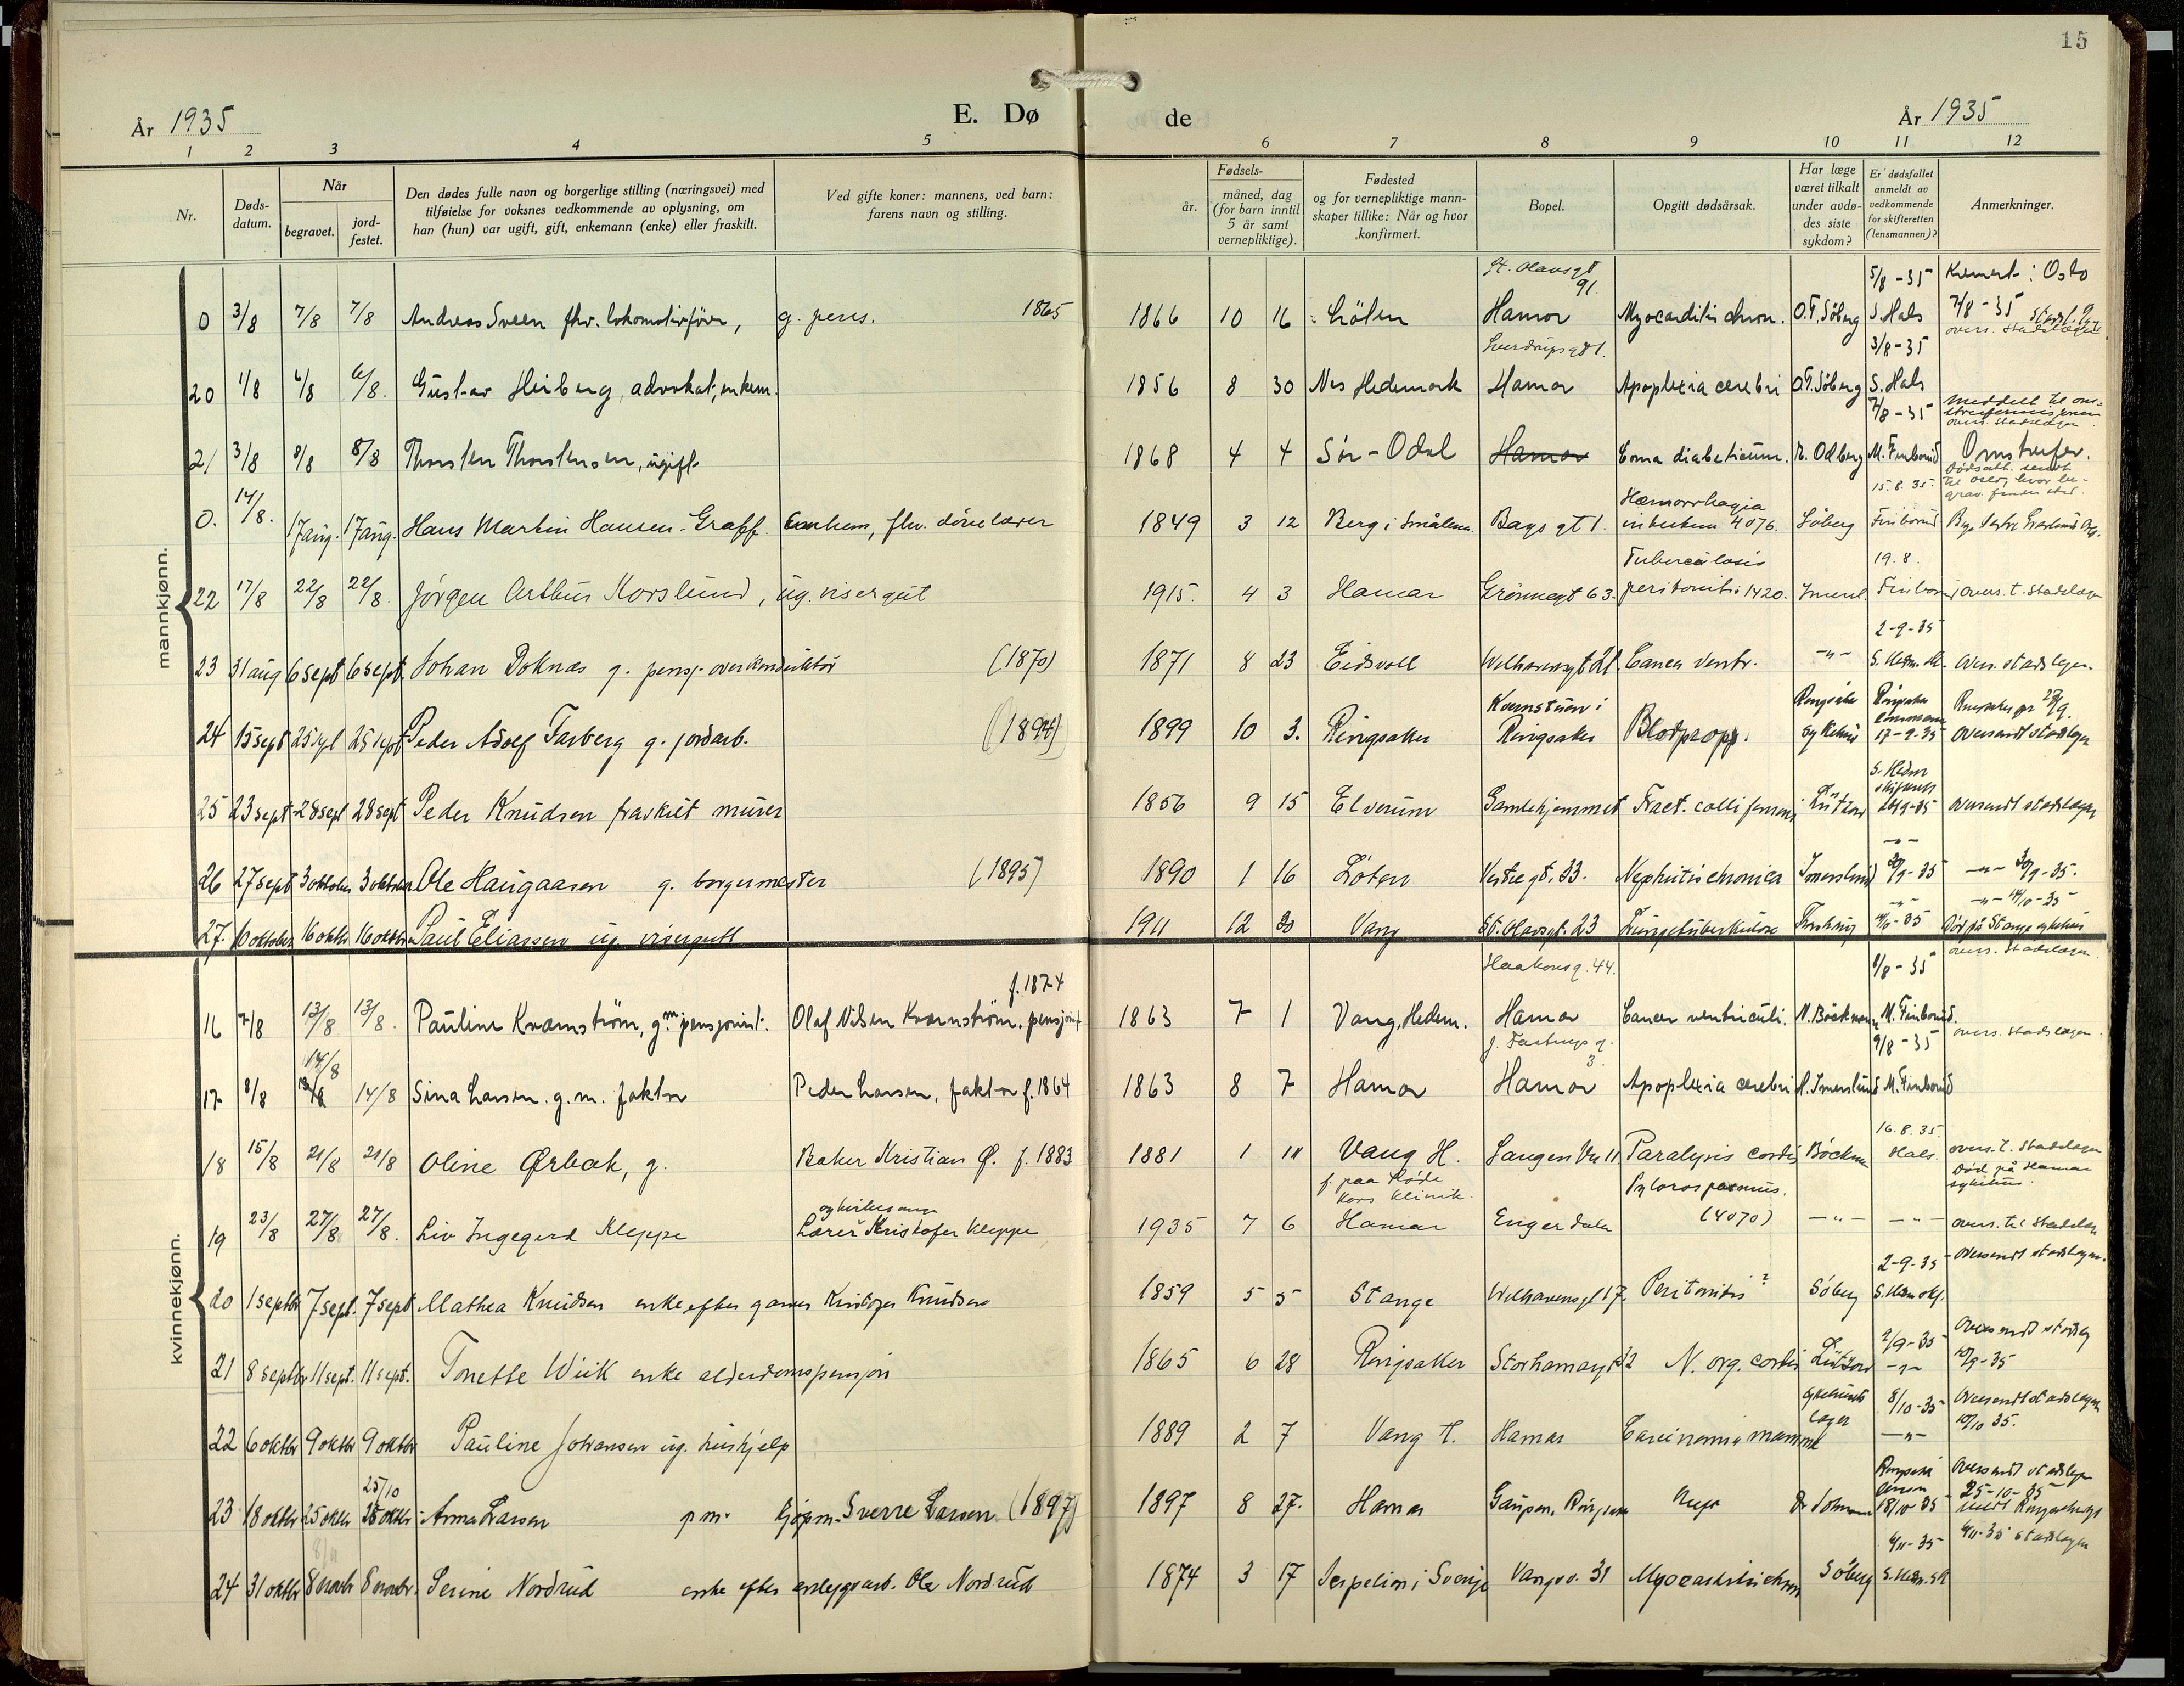 SAH, Hamar prestekontor, H/Ha/Haa/L0007: Ministerialbok nr. 7, 1933-1953, s. 15